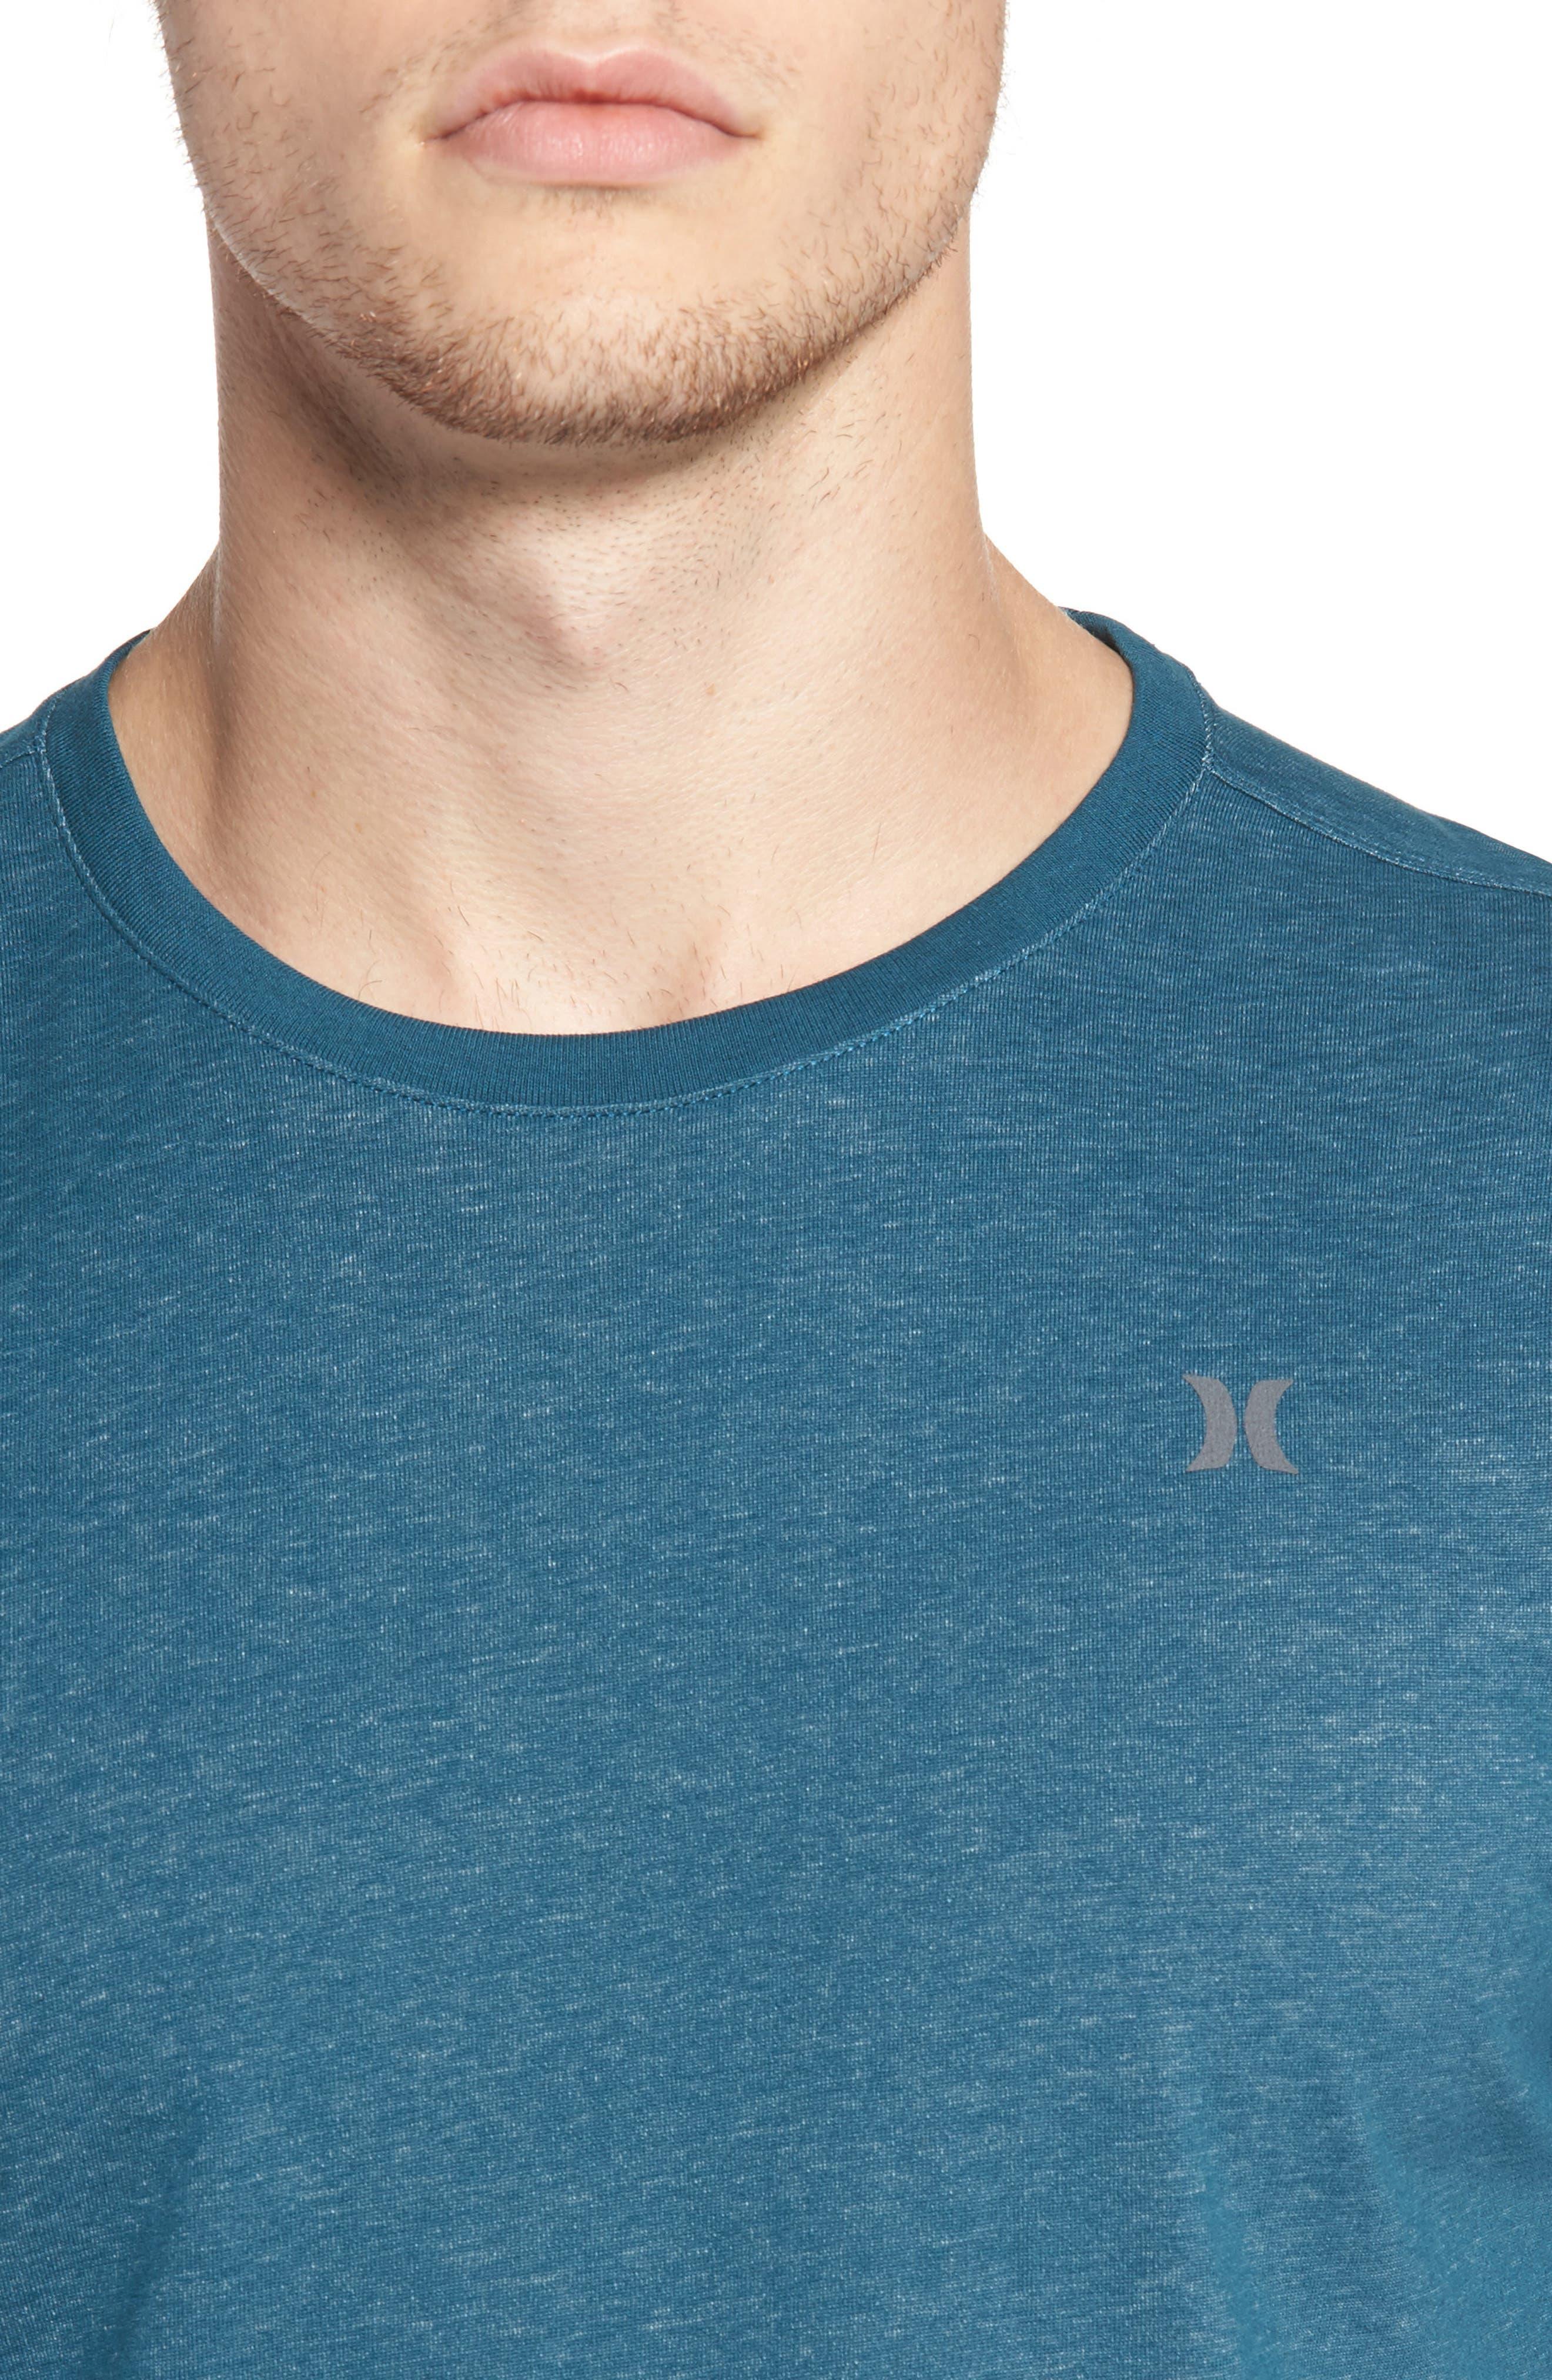 Lagos Snapper Dri-FIT T-Shirt,                             Alternate thumbnail 11, color,